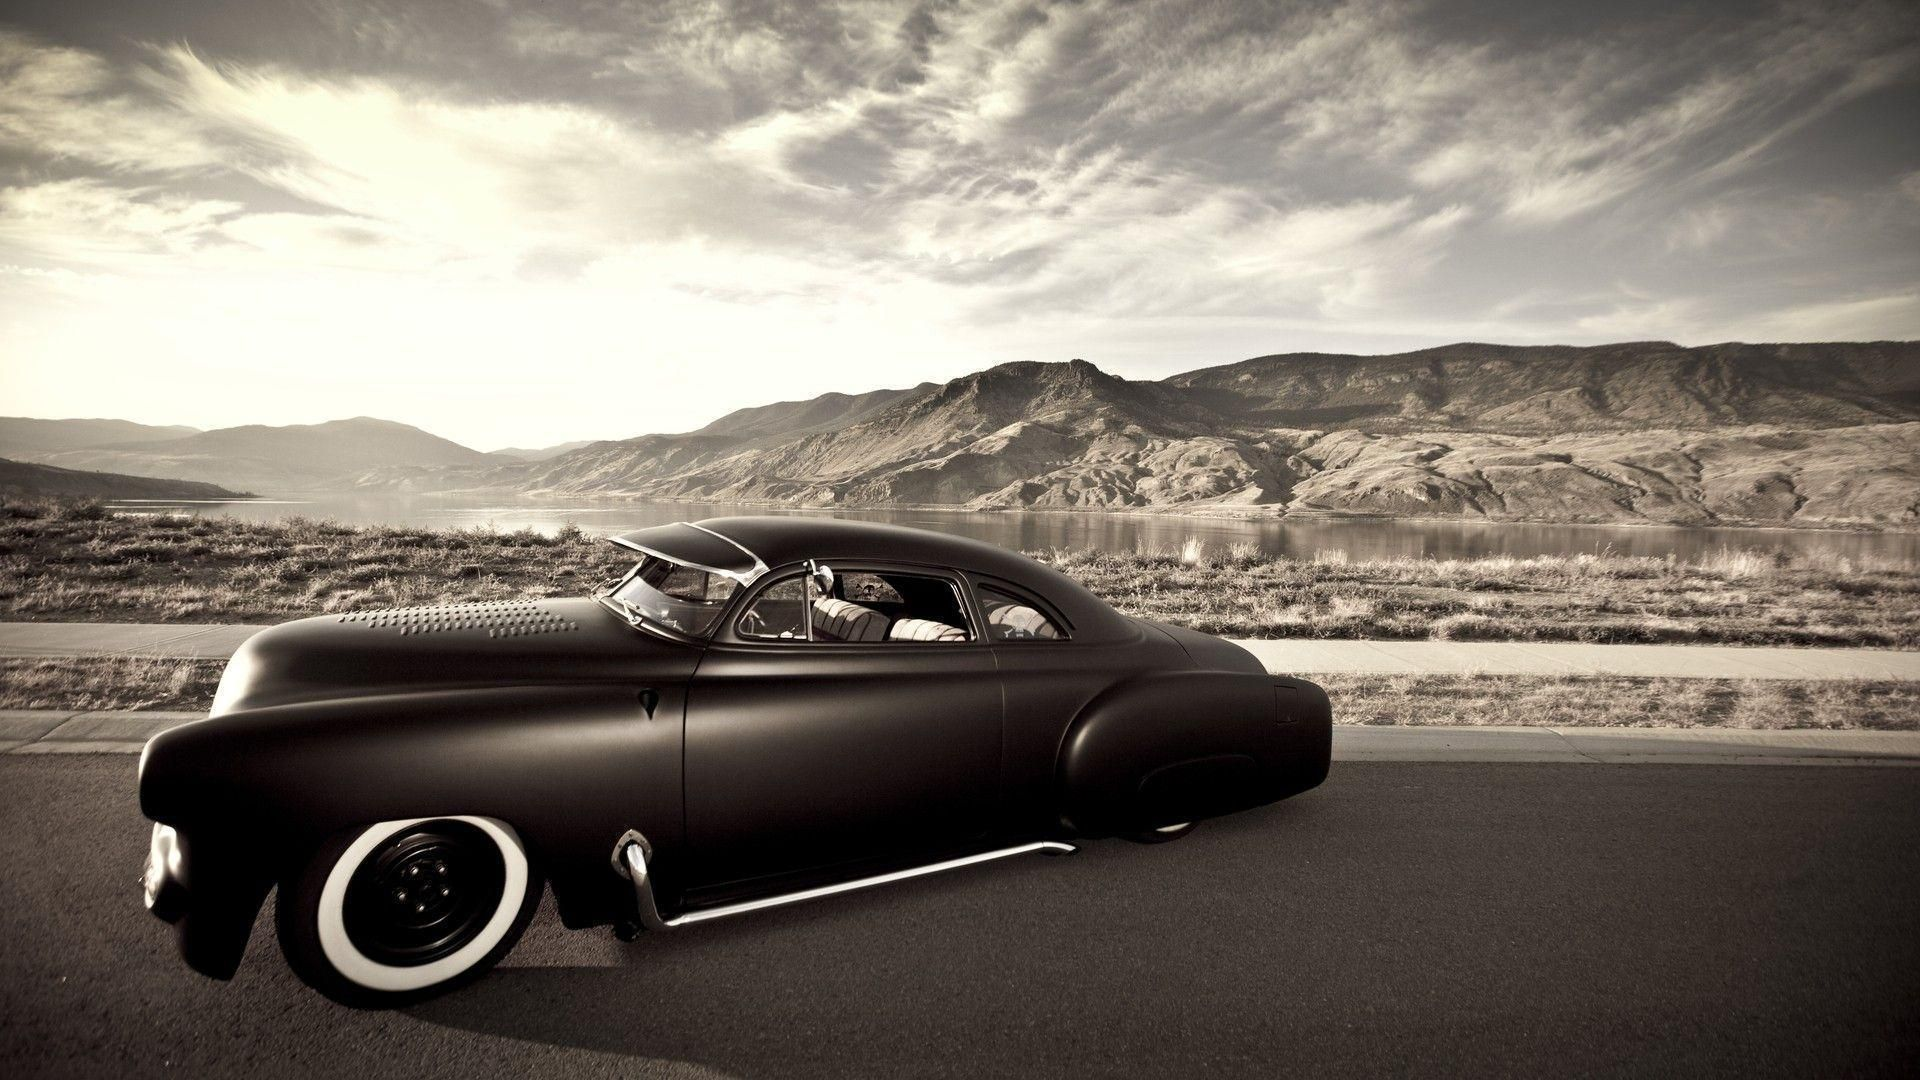 Rat Rod Car Full Hd Wallpapers Free Download 4 Com Imagens